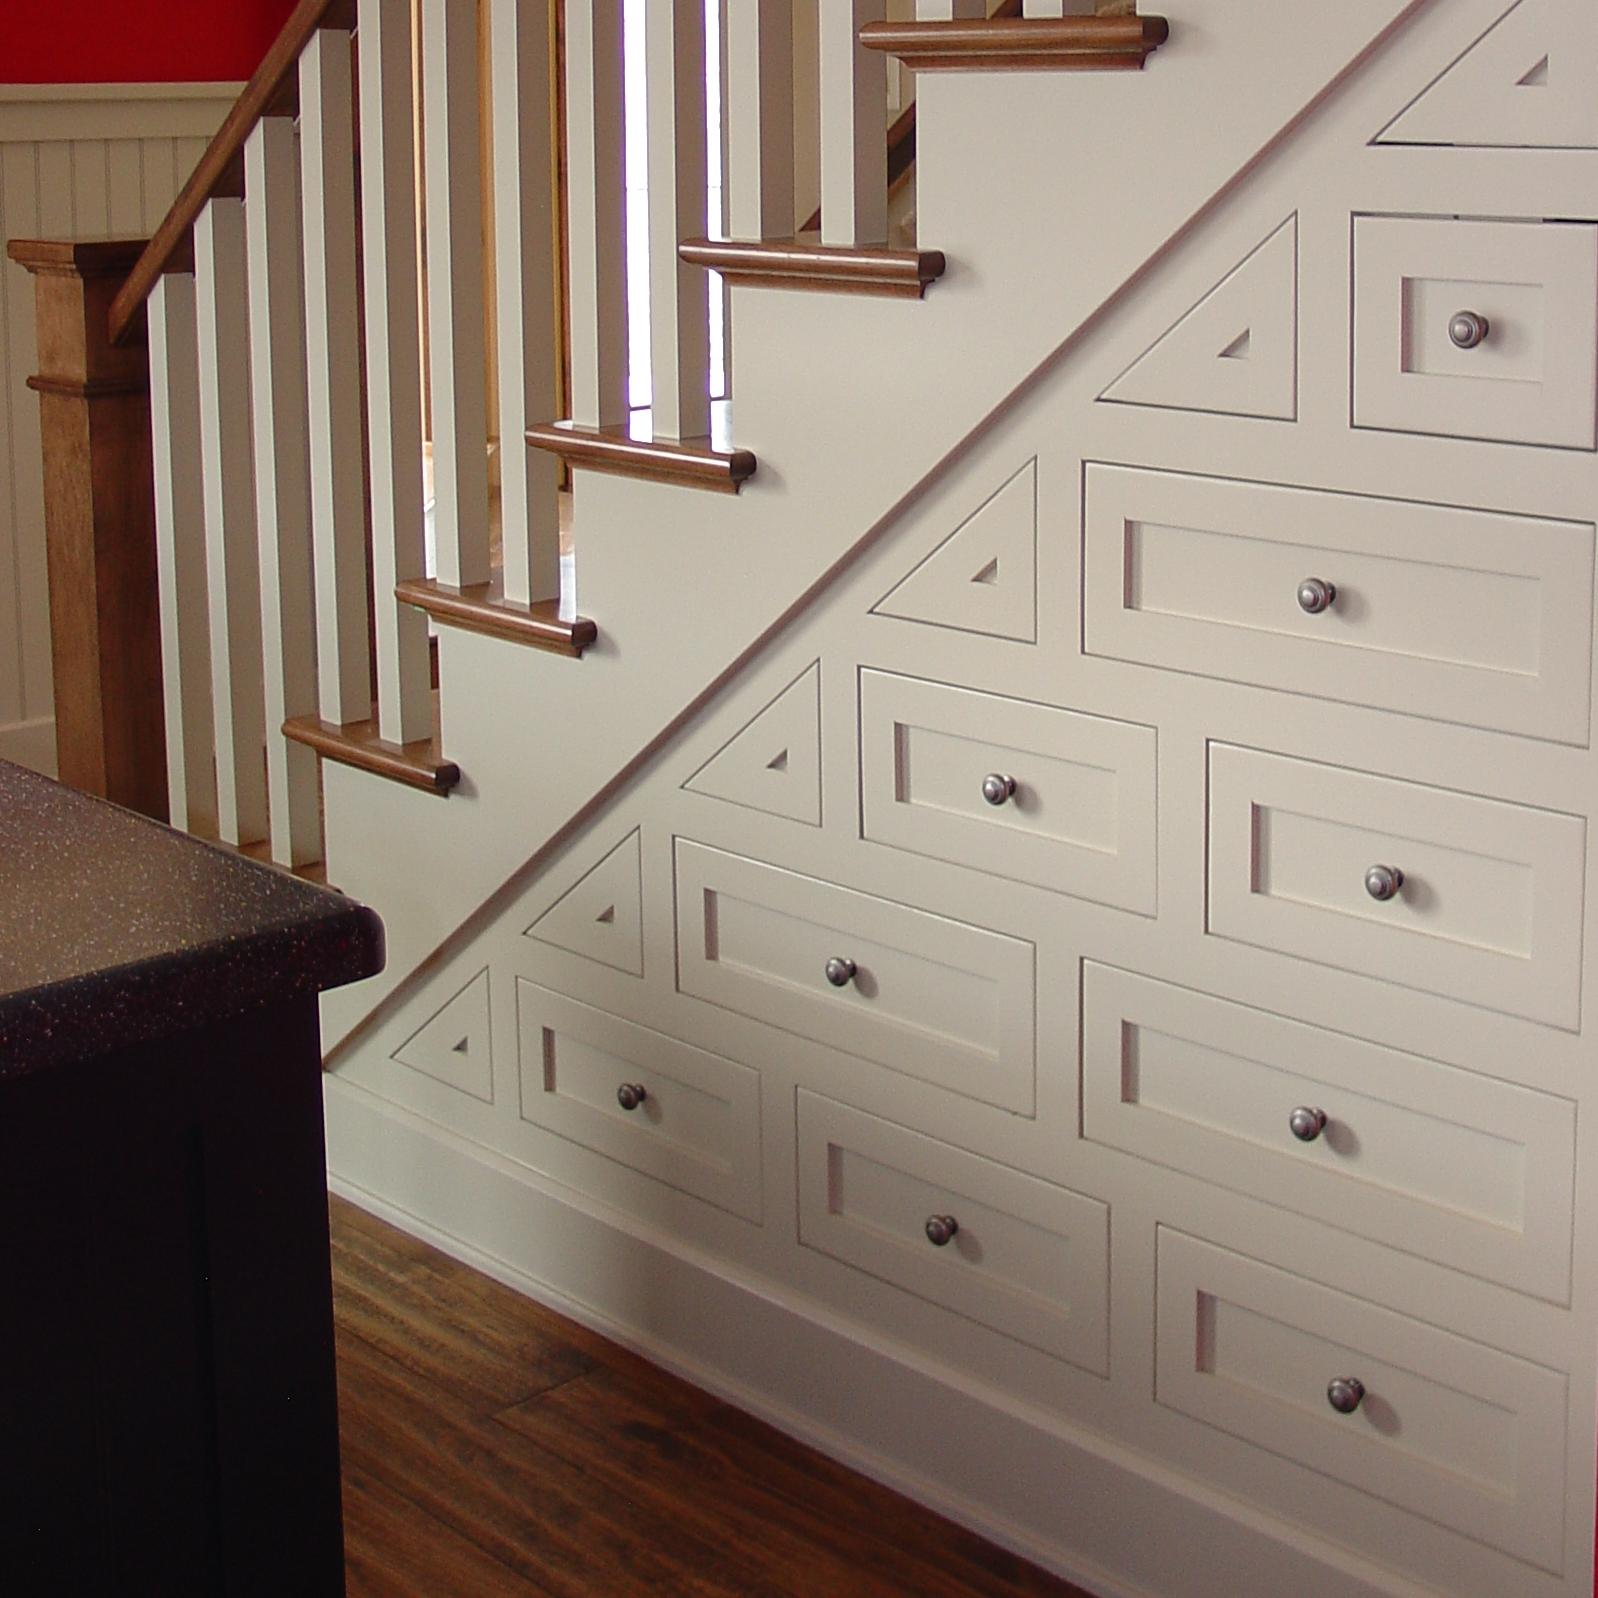 RCH-detail-stair-drawers.JPG